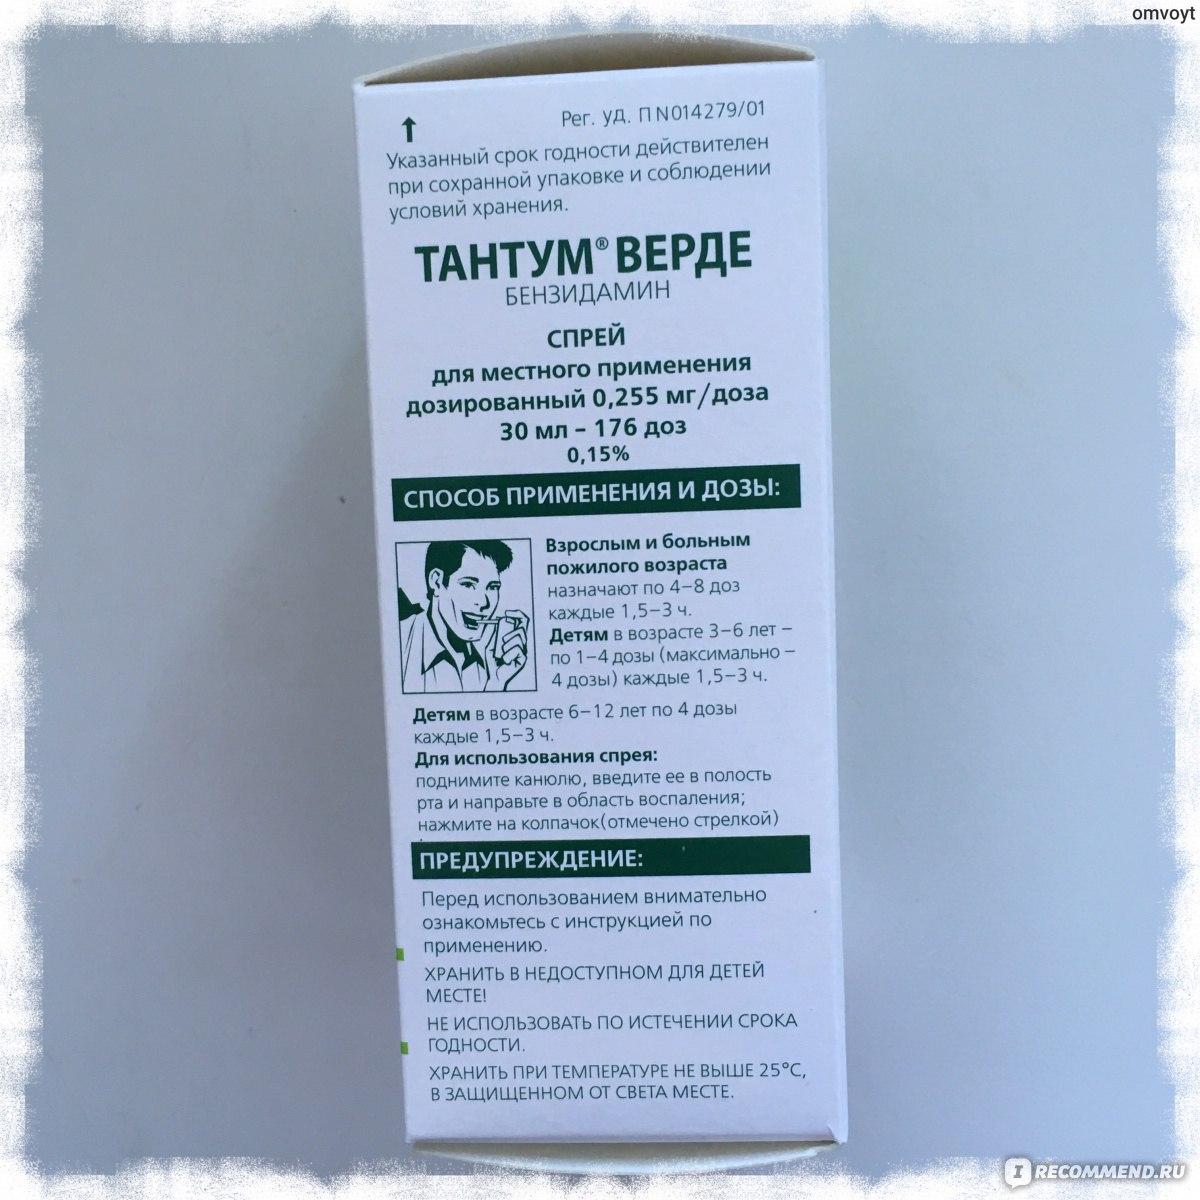 Дженерики тантум верде: список аналогов препарата